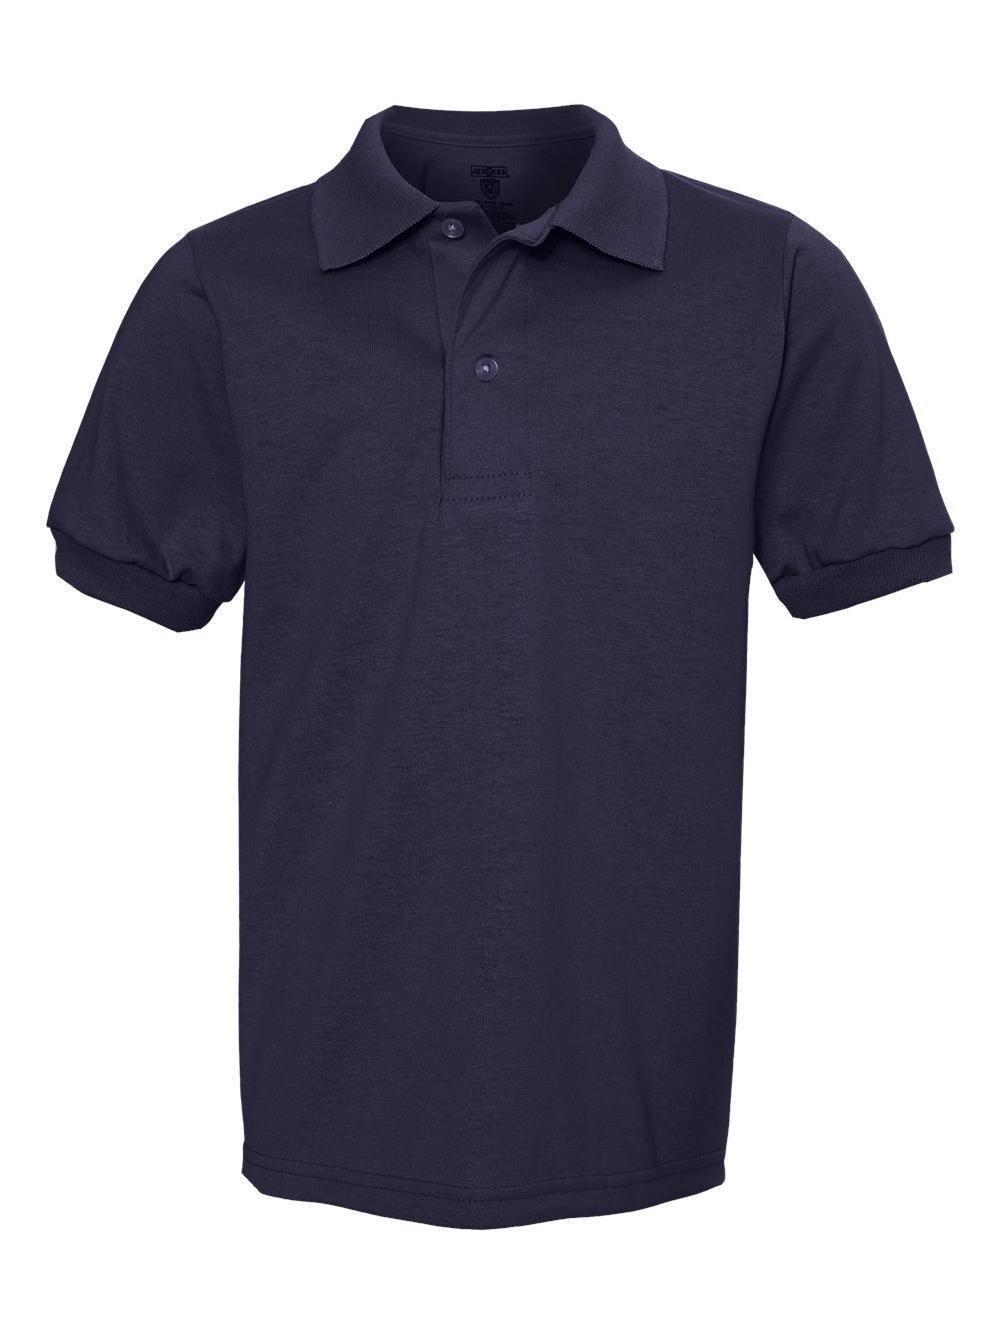 Jerzees Sport Shirts Youth SpotShield™ 50/50 Sport Shirt